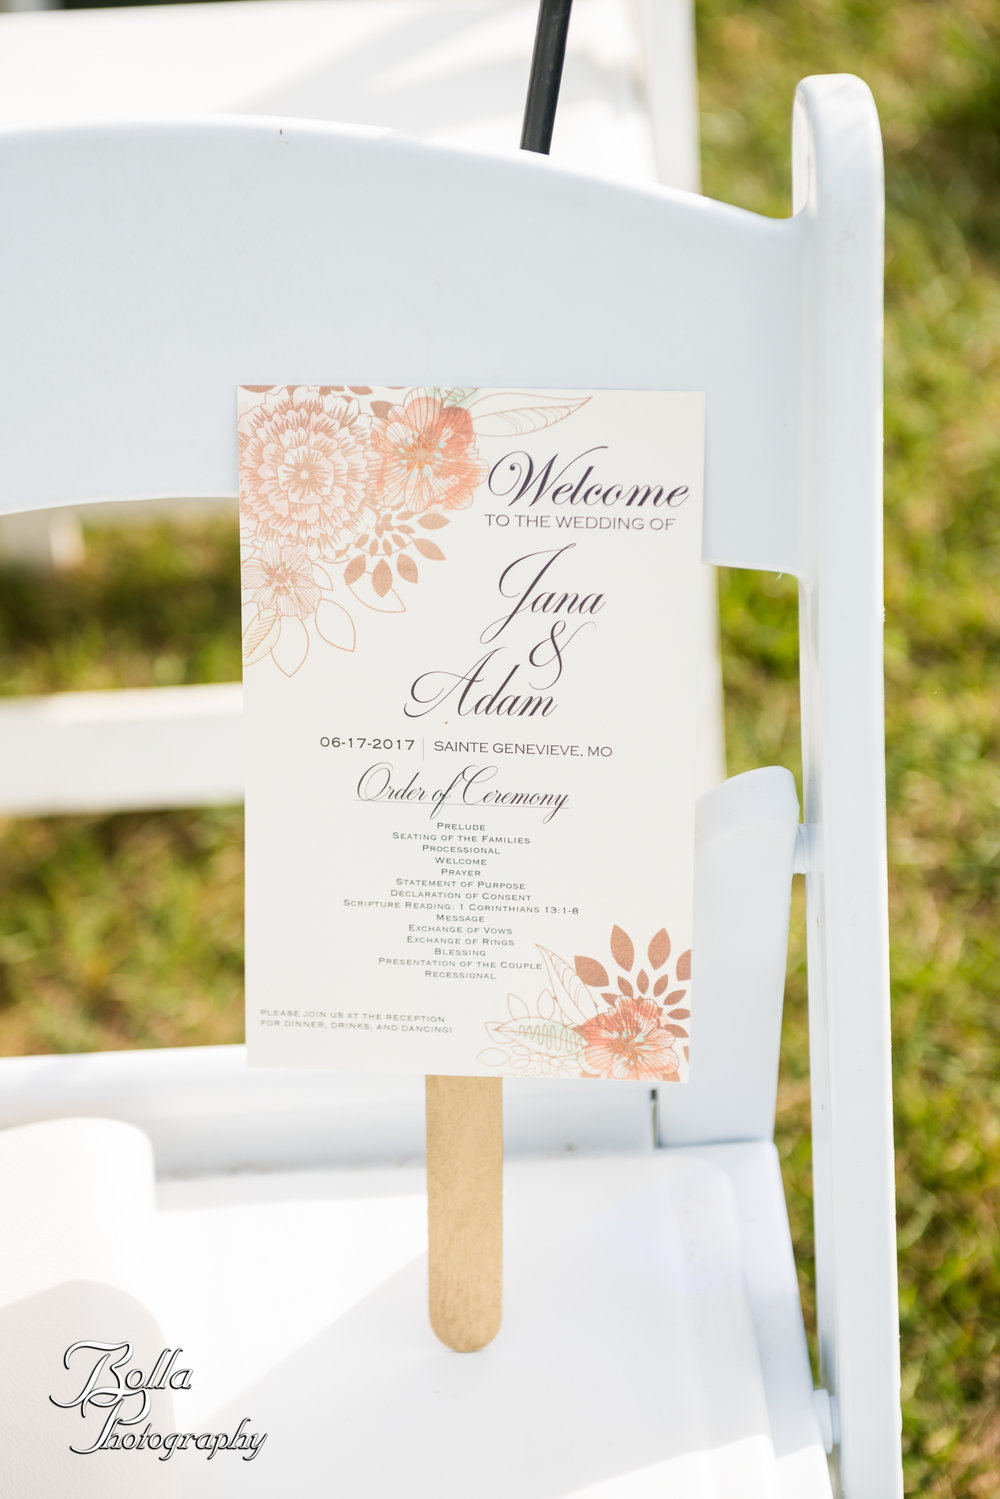 Bolla_photography_edwardsville_wedding_photographer_st_louis_weddings_Chaumette_winery_Mikusch-0301.jpg